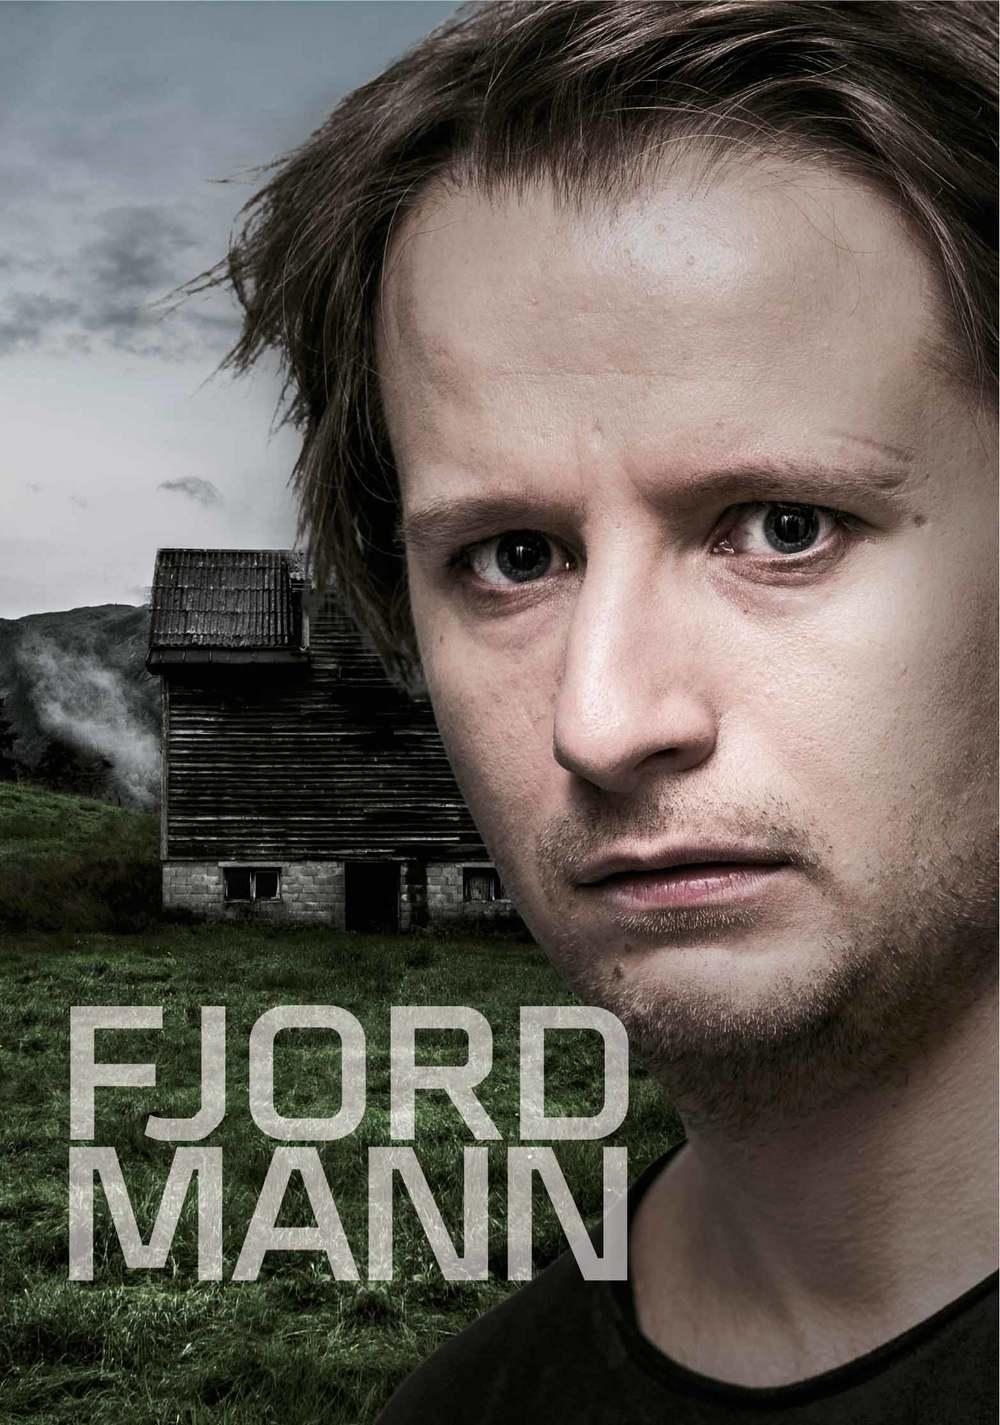 Fjordmann